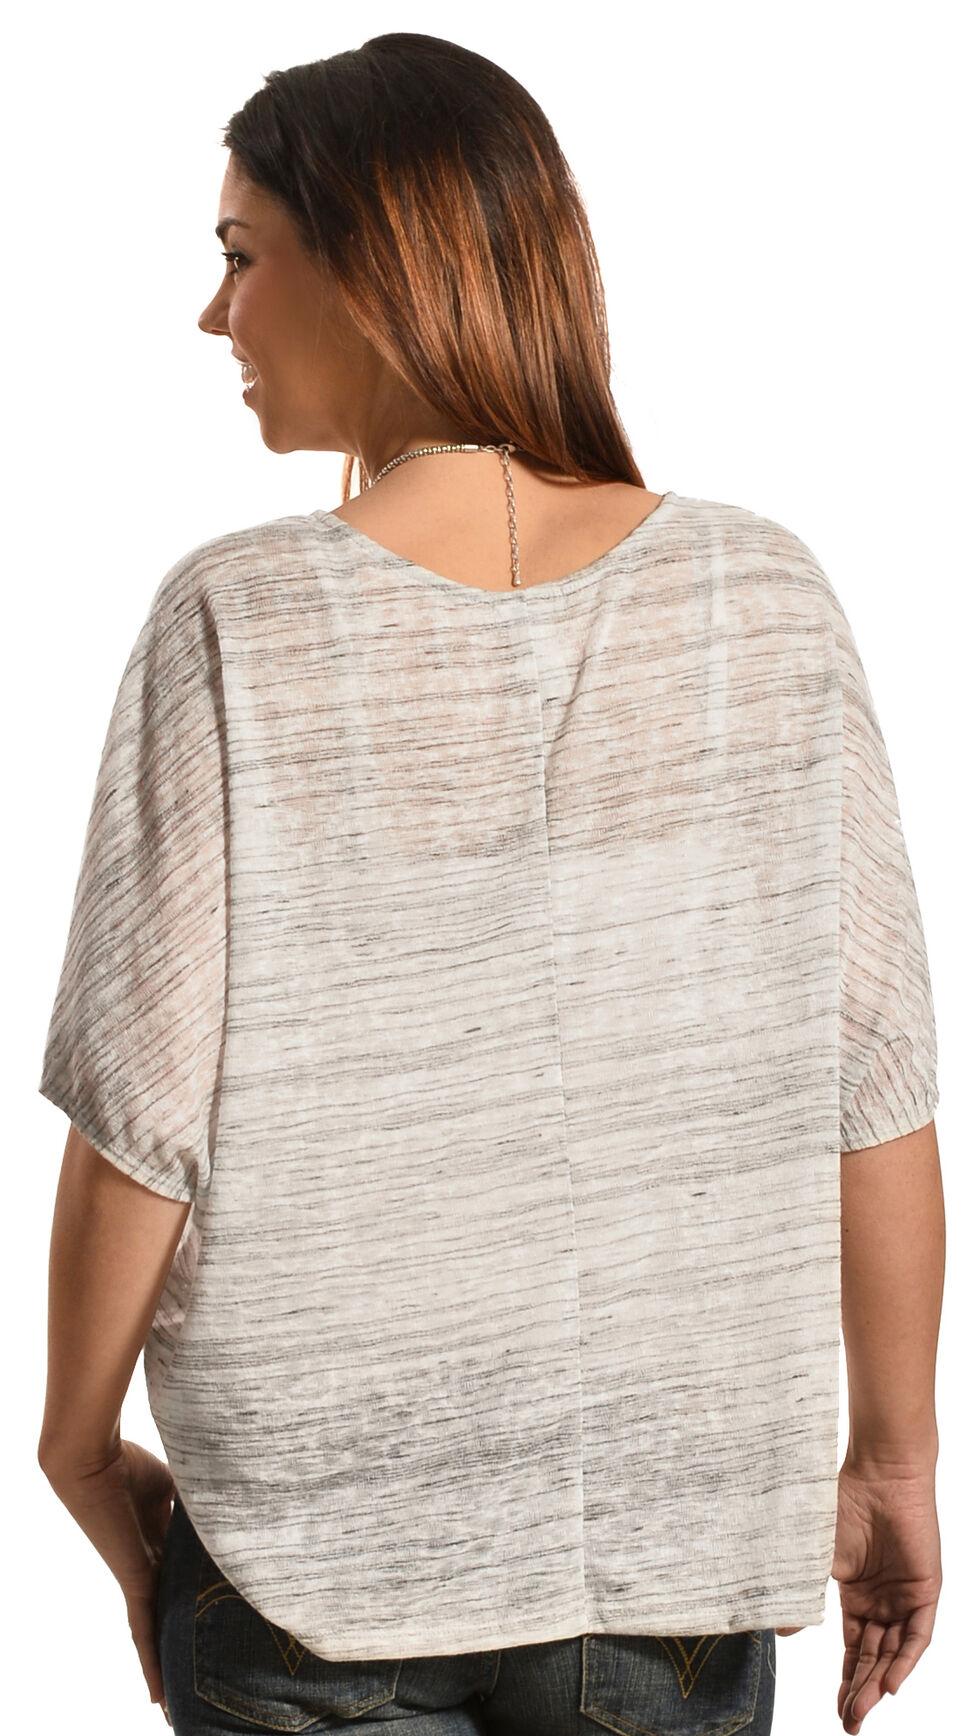 Petrol Women's Short Sleeve Poncho, Grey, hi-res